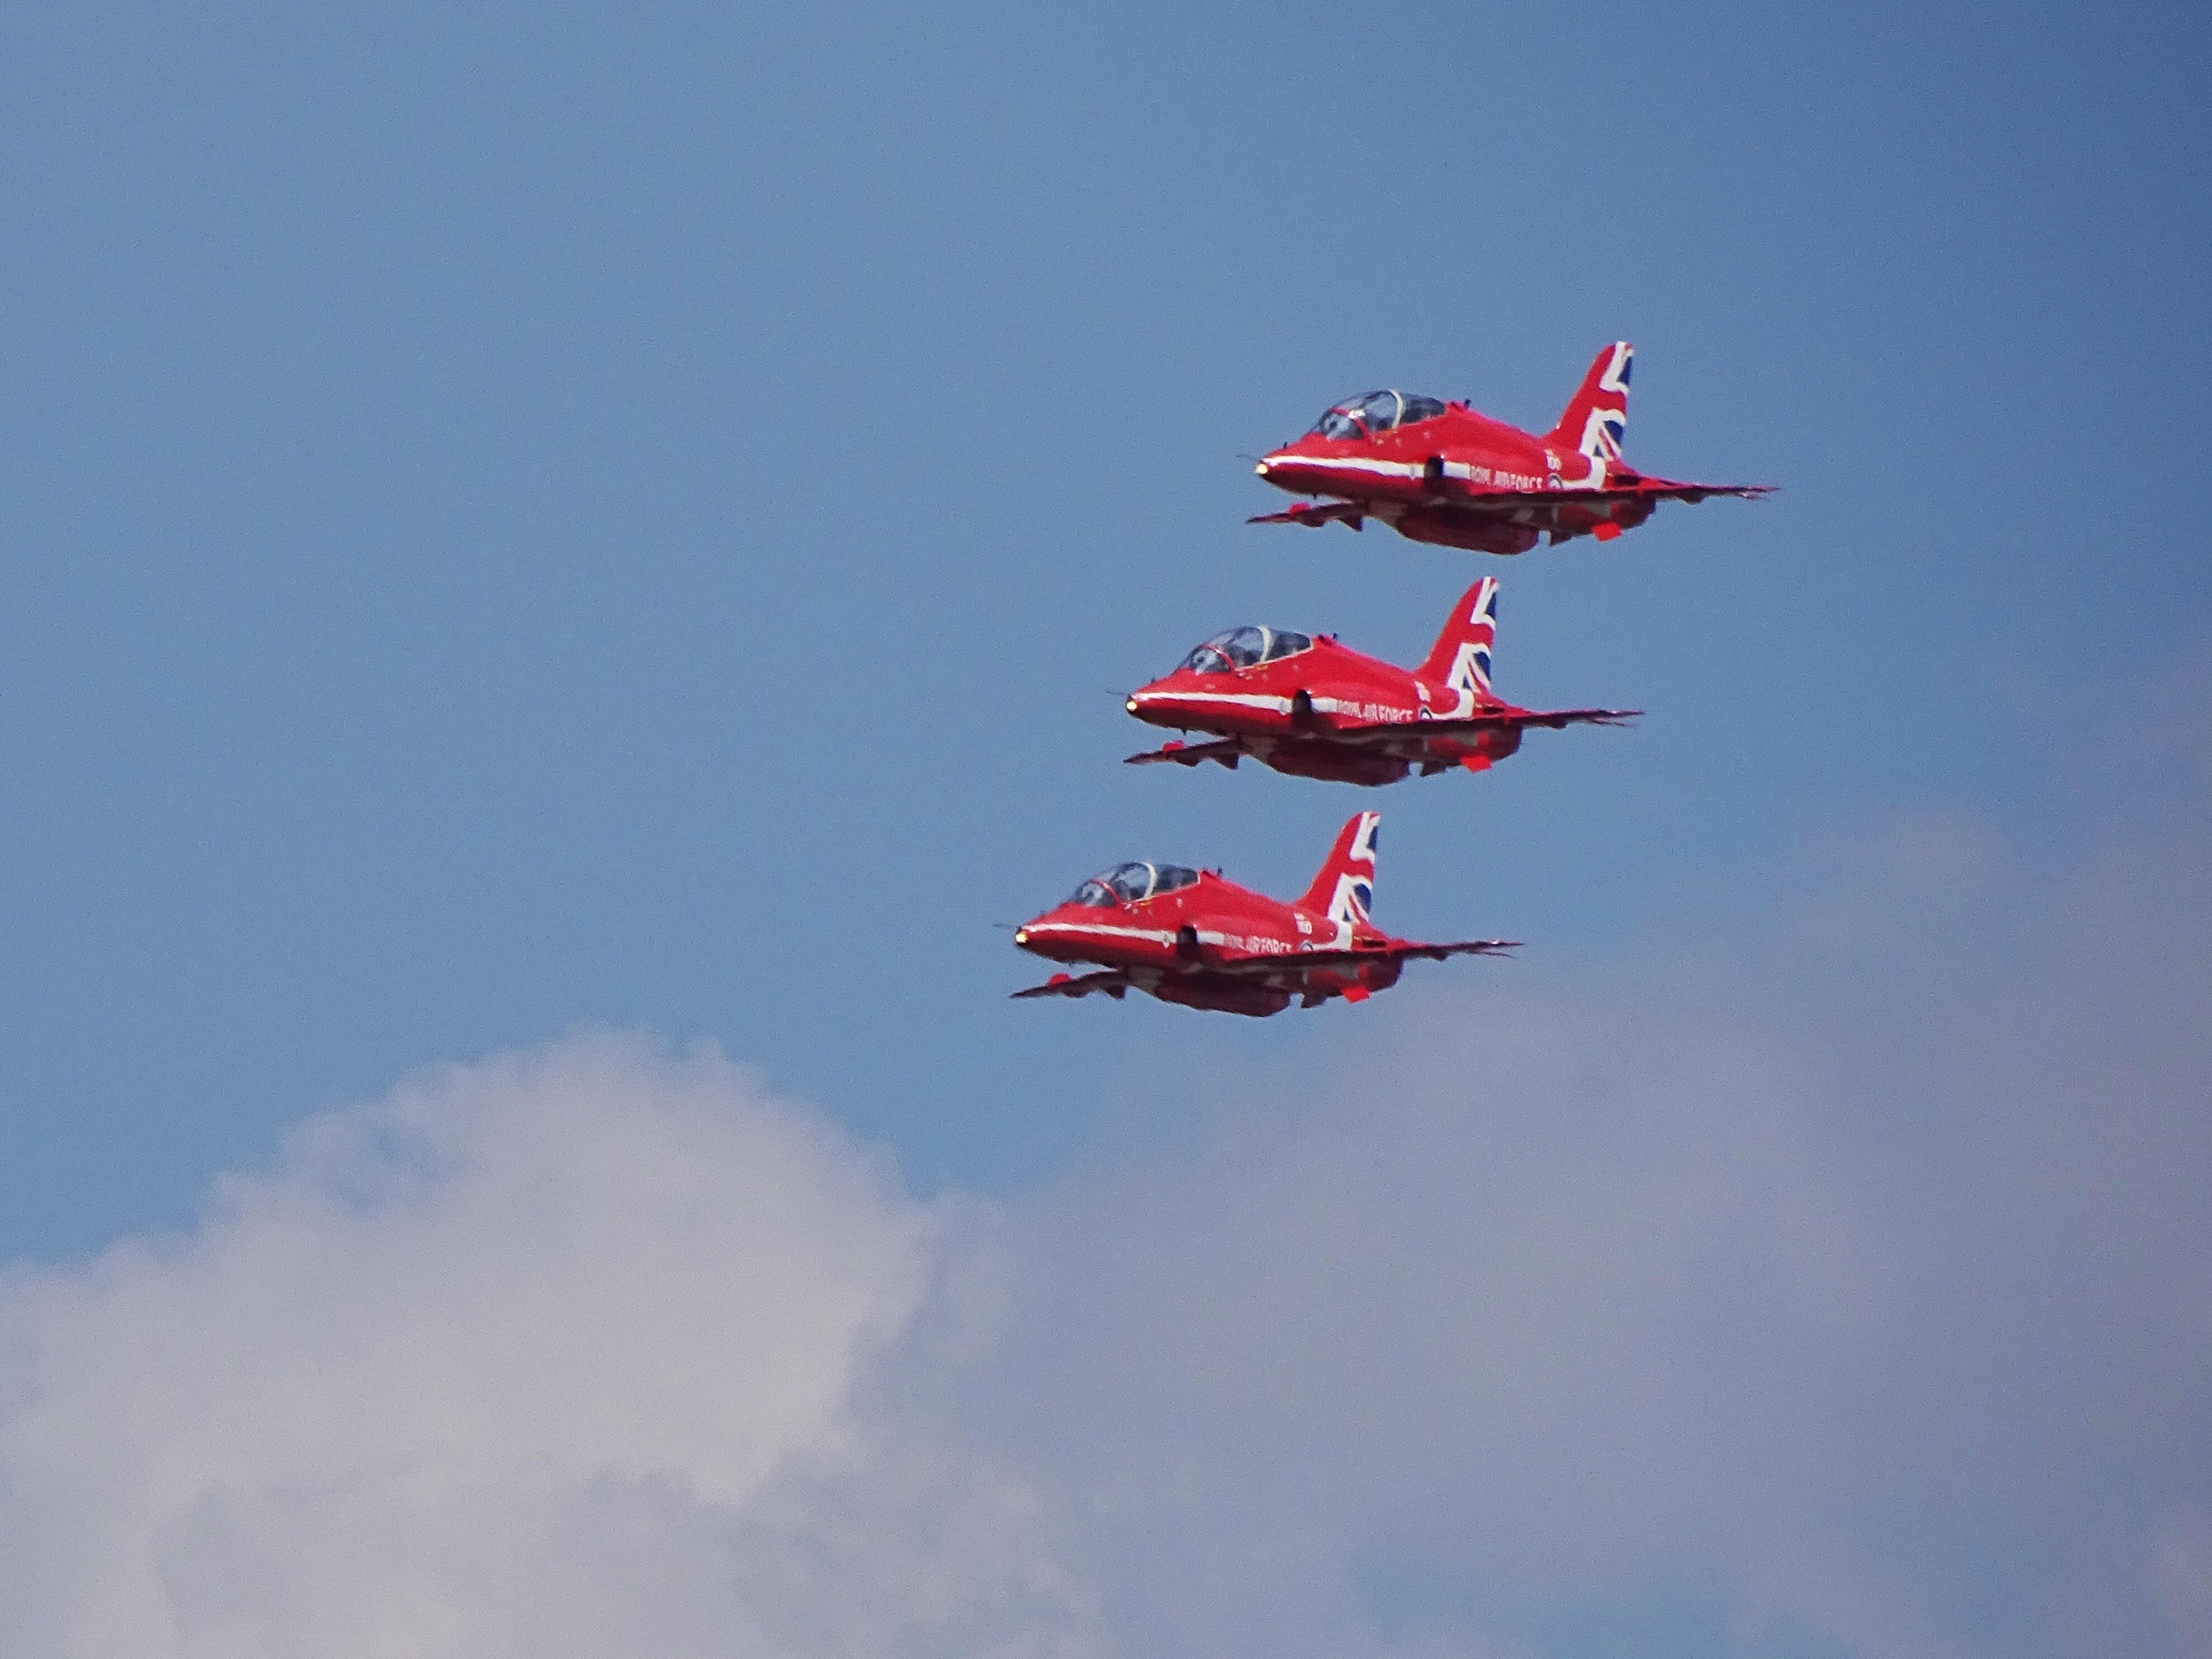 three aircraft's photo